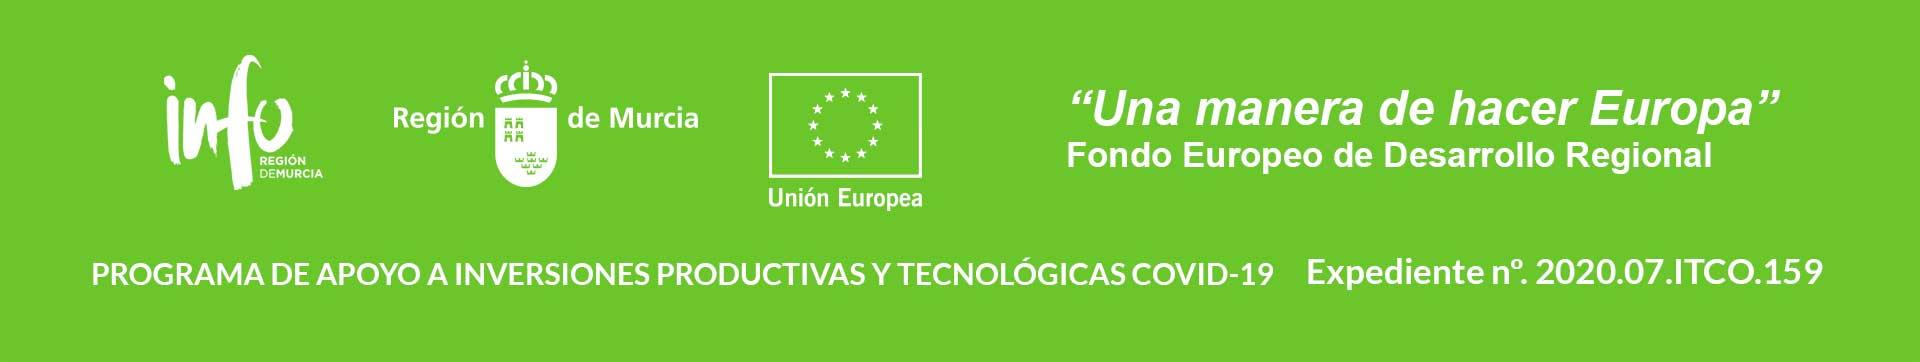 INFO Instituto de Fomento Región de Murcia